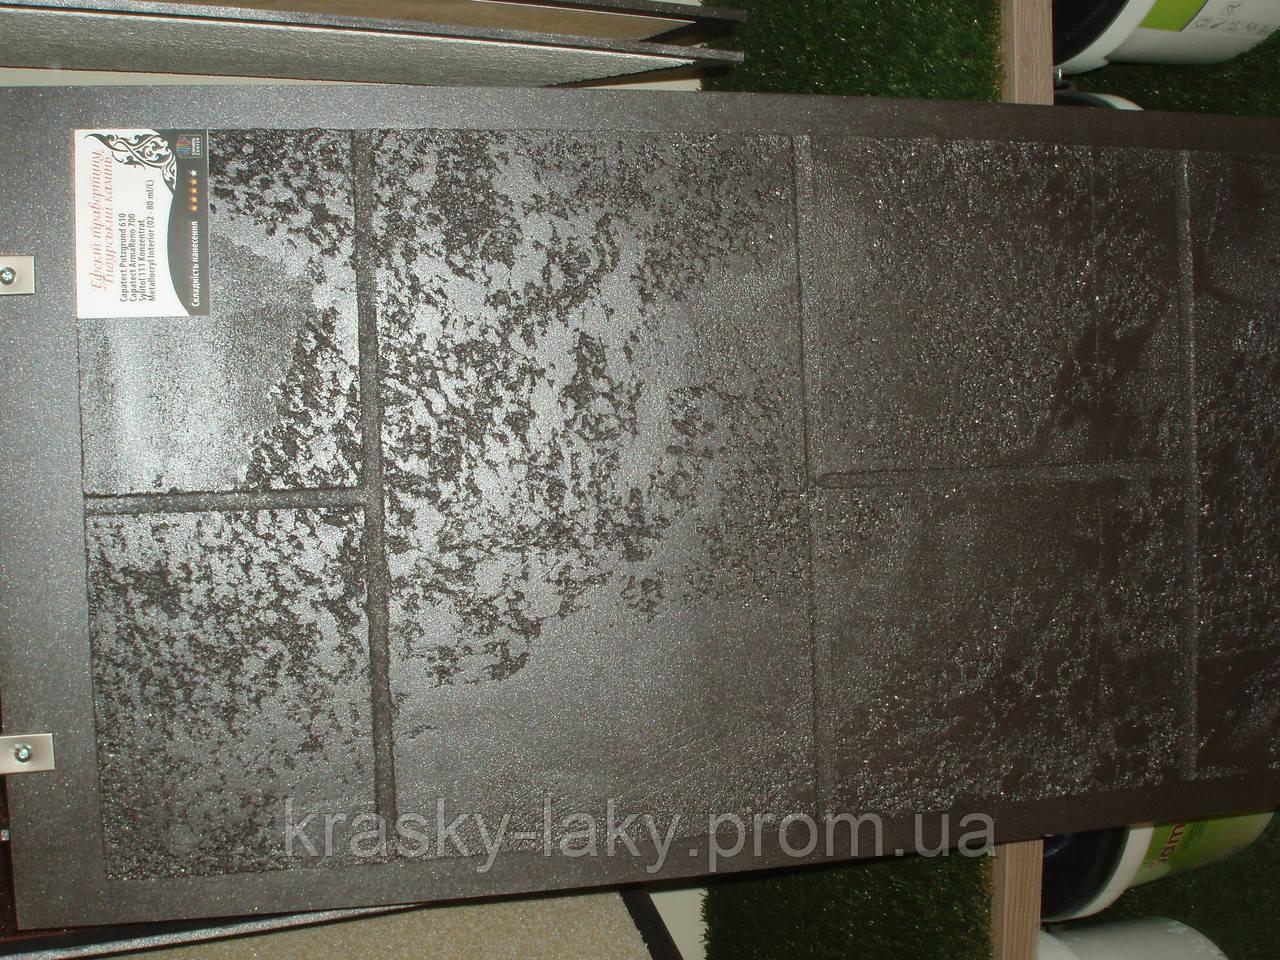 Краска металлик Capadecor Metallocryl INTERIOR Caparol, 2.5л